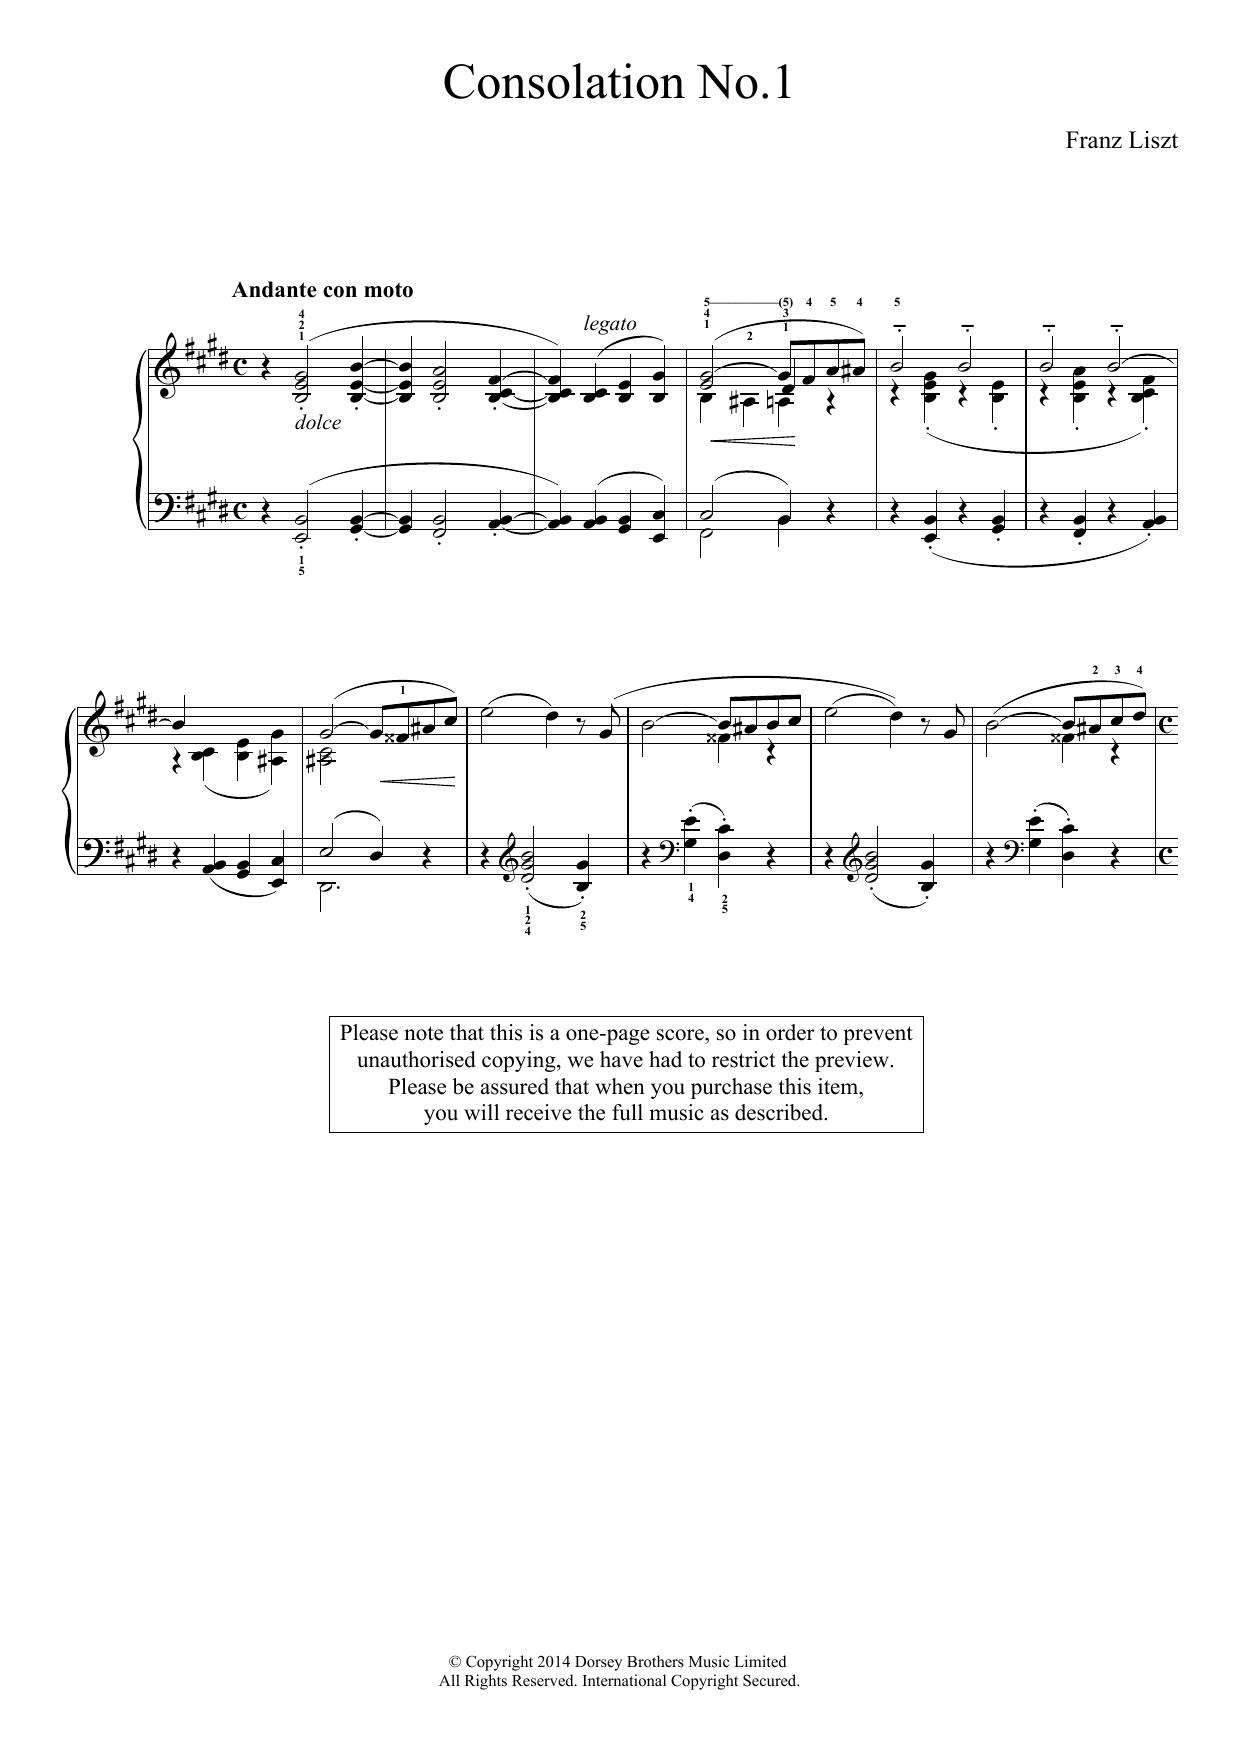 Franz Liszt - Consolation No.1